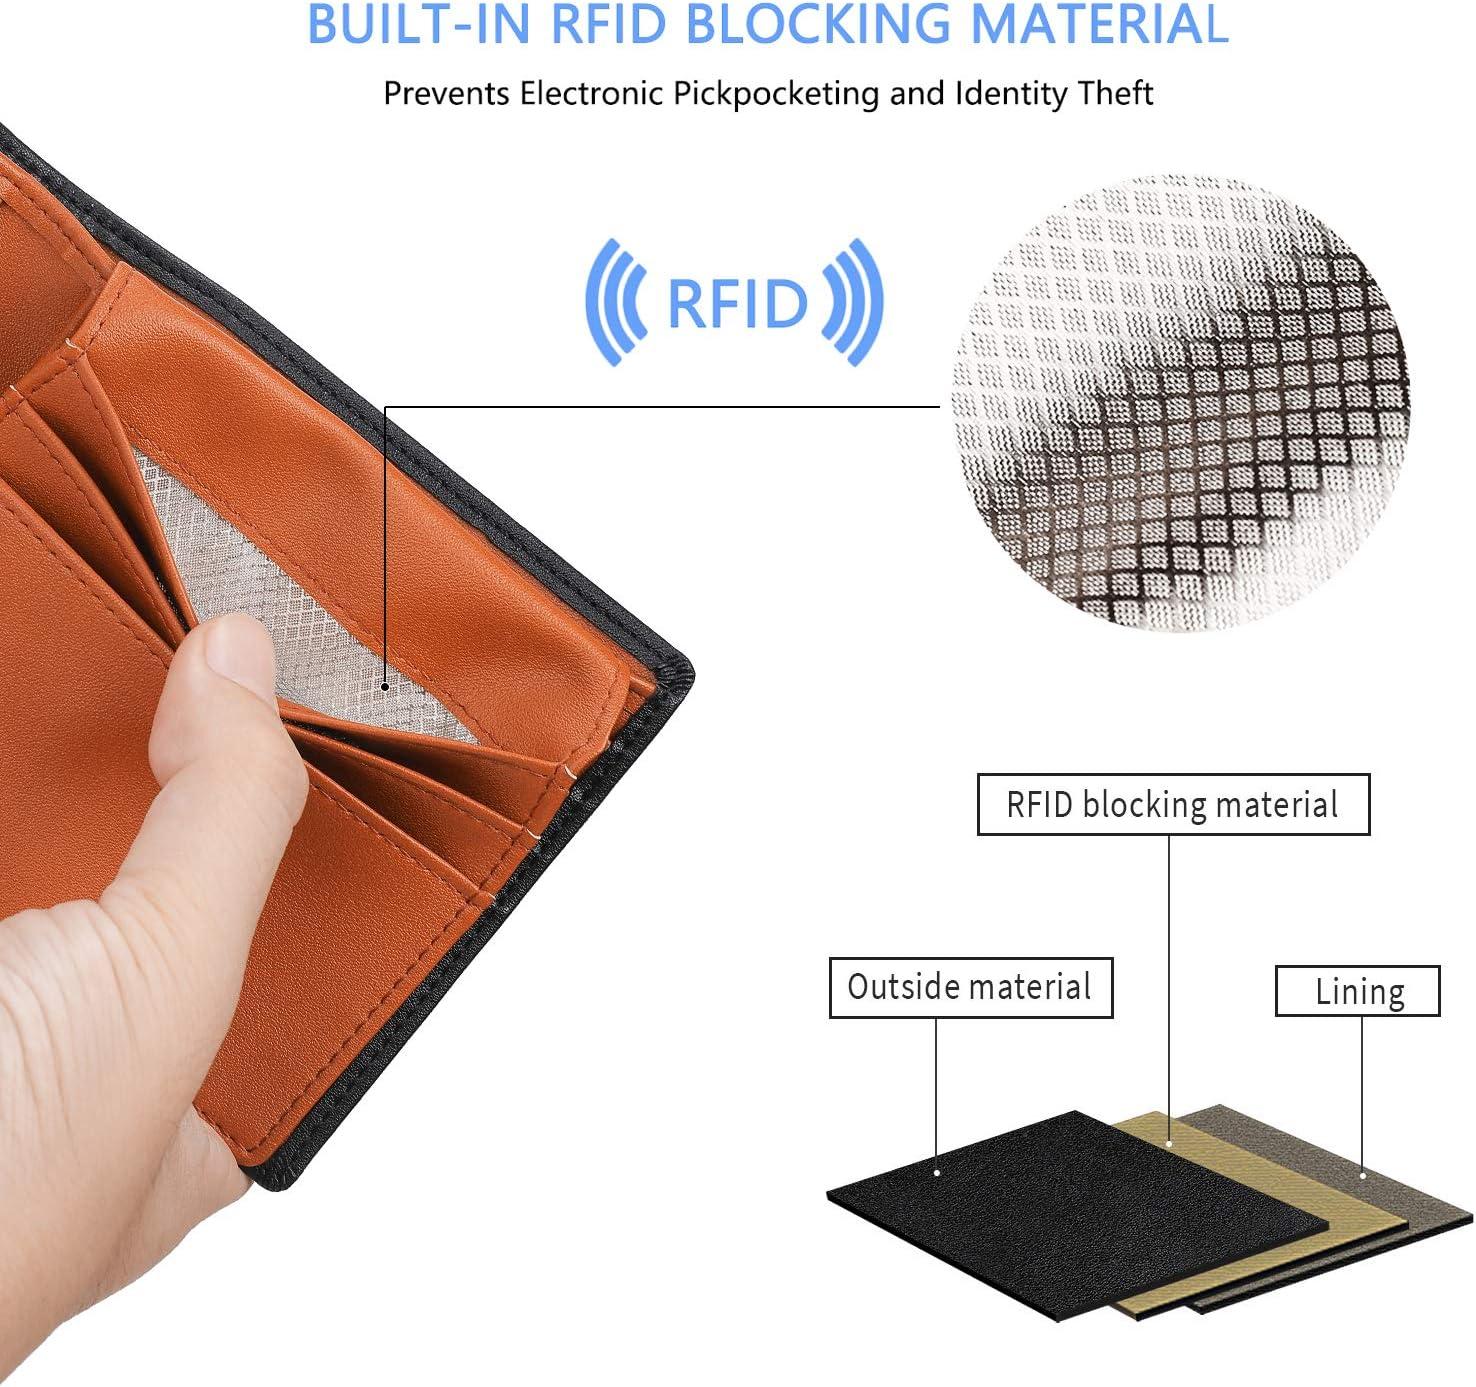 Fathers Day Gift Vemingo Wallets for Men RFID Blocking Stylish Mens Wallet with Clear ID Window Slim Credit Card Holder XB-44 Black+Orange Xb-37 Black+orange